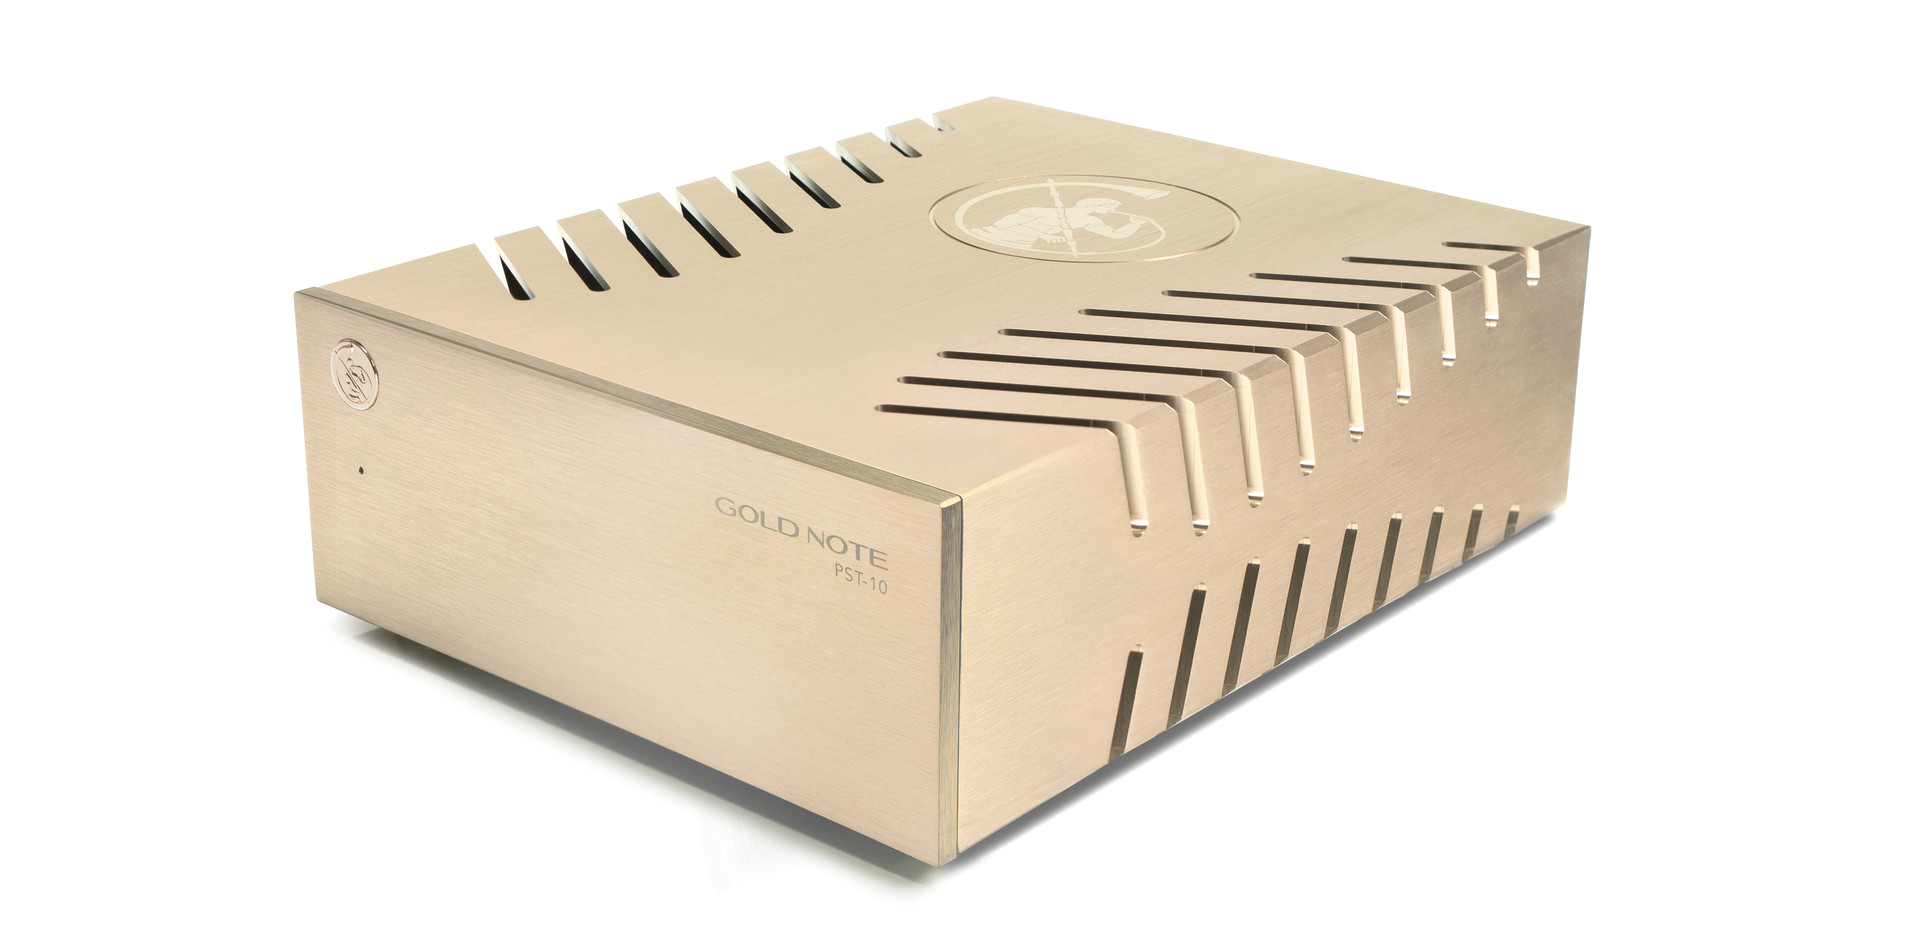 PST-10-Gold